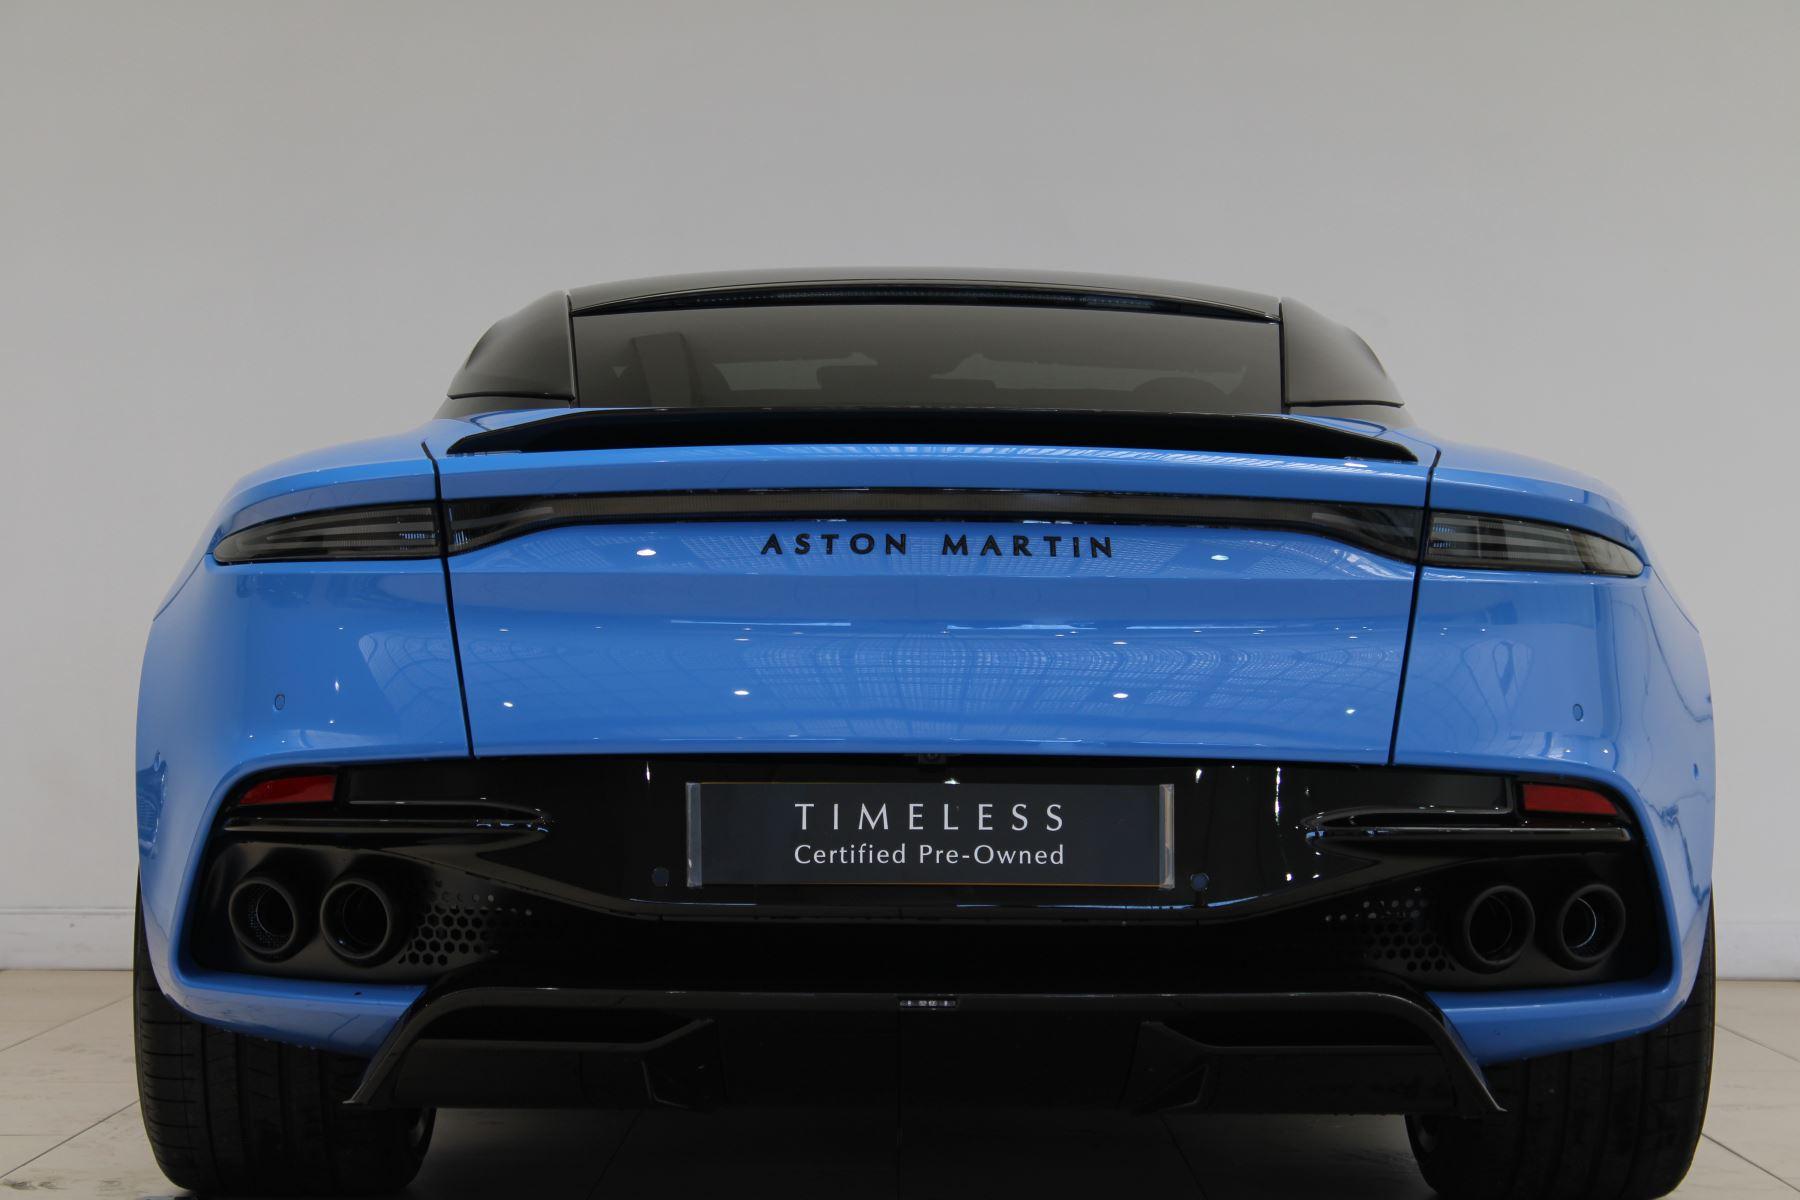 Aston Martin DBS V12 Superleggera Touchtronic Special Ceramic Blue - B&O image 4